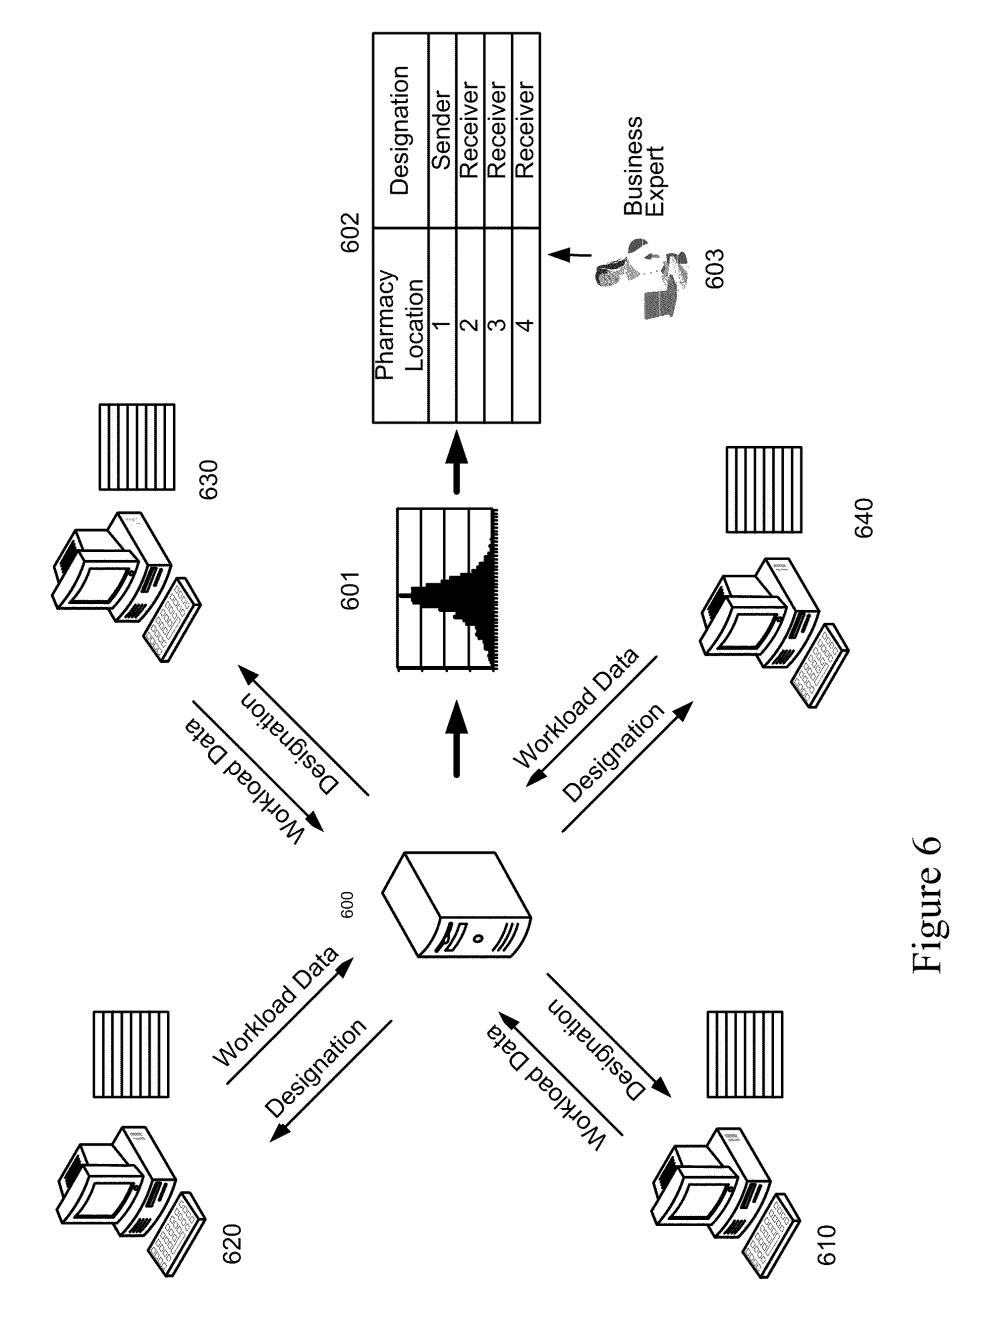 medium resolution of caterpillar d8k for parts diagrams caterpillar engine parts diagrams goodall schematic goodall start